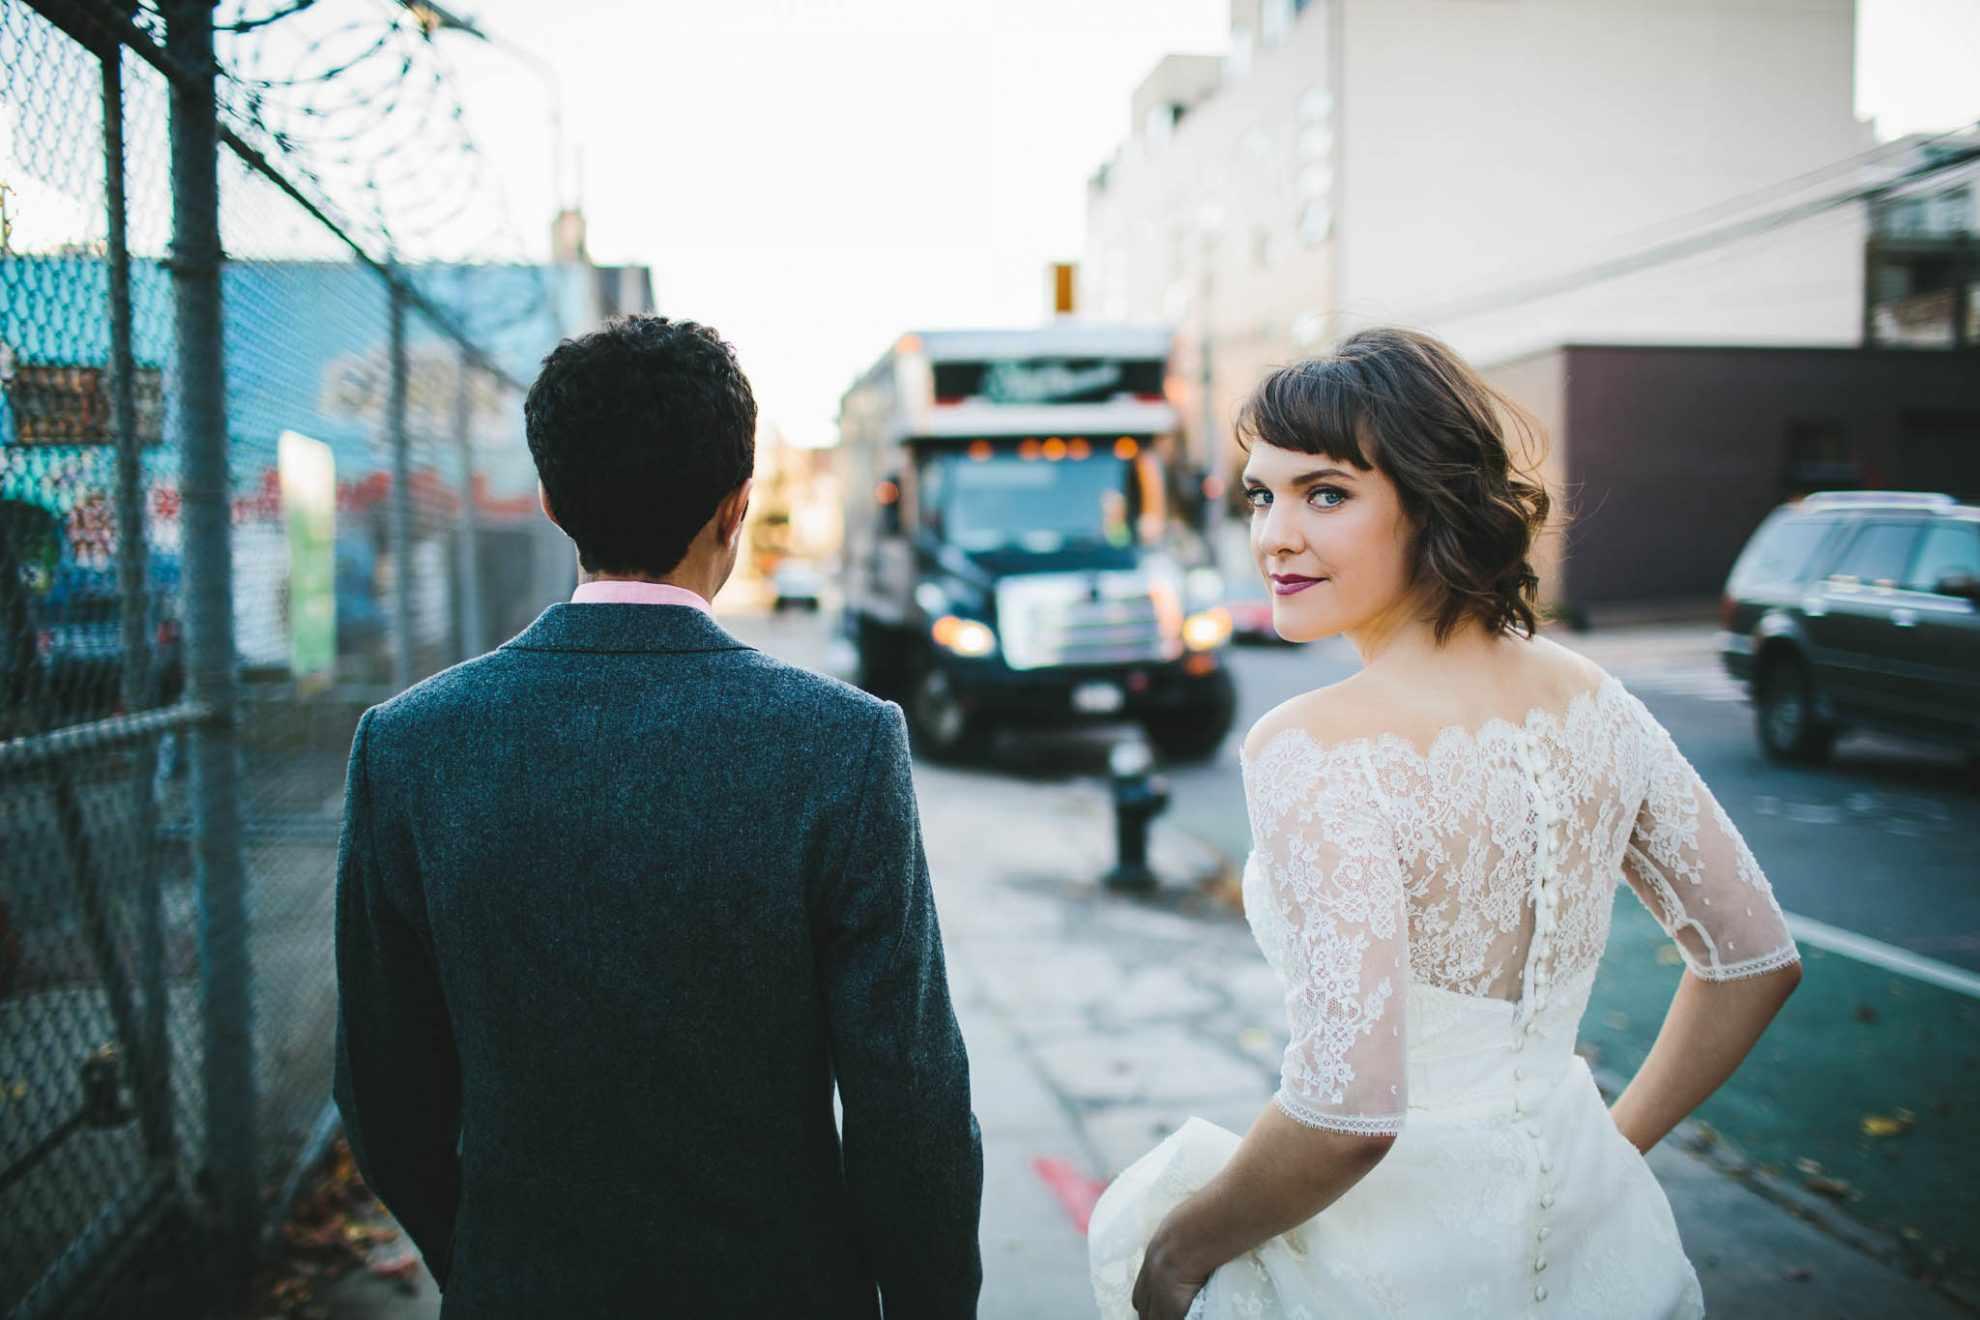 bride and groom walking in an urban destination